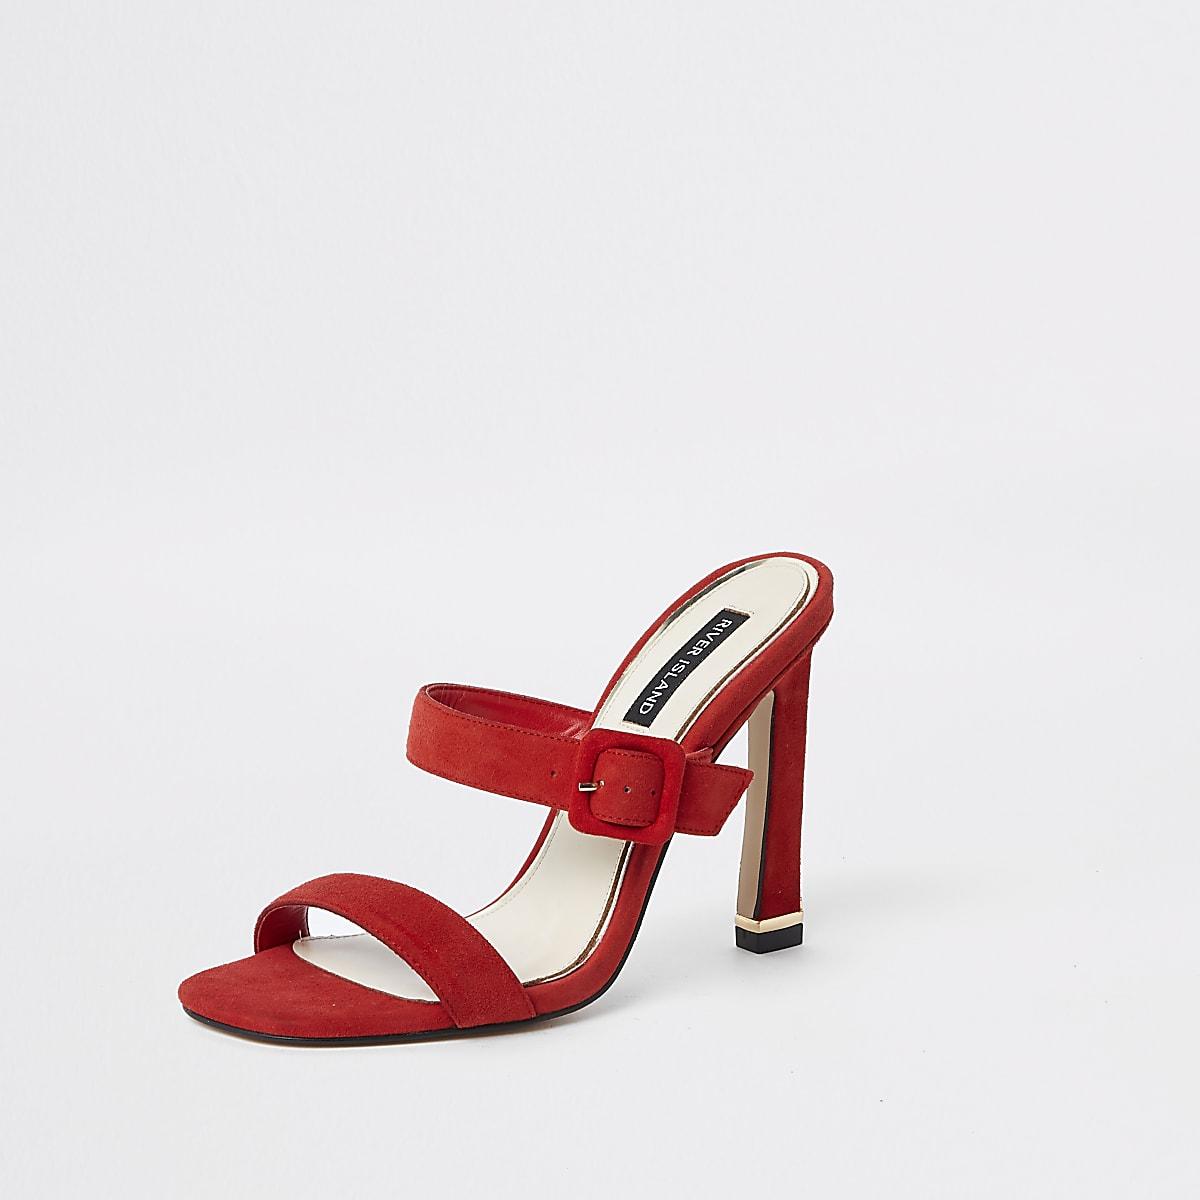 df428d4a60f5d Red suede double strap mules - Sandals - Shoes & Boots - women